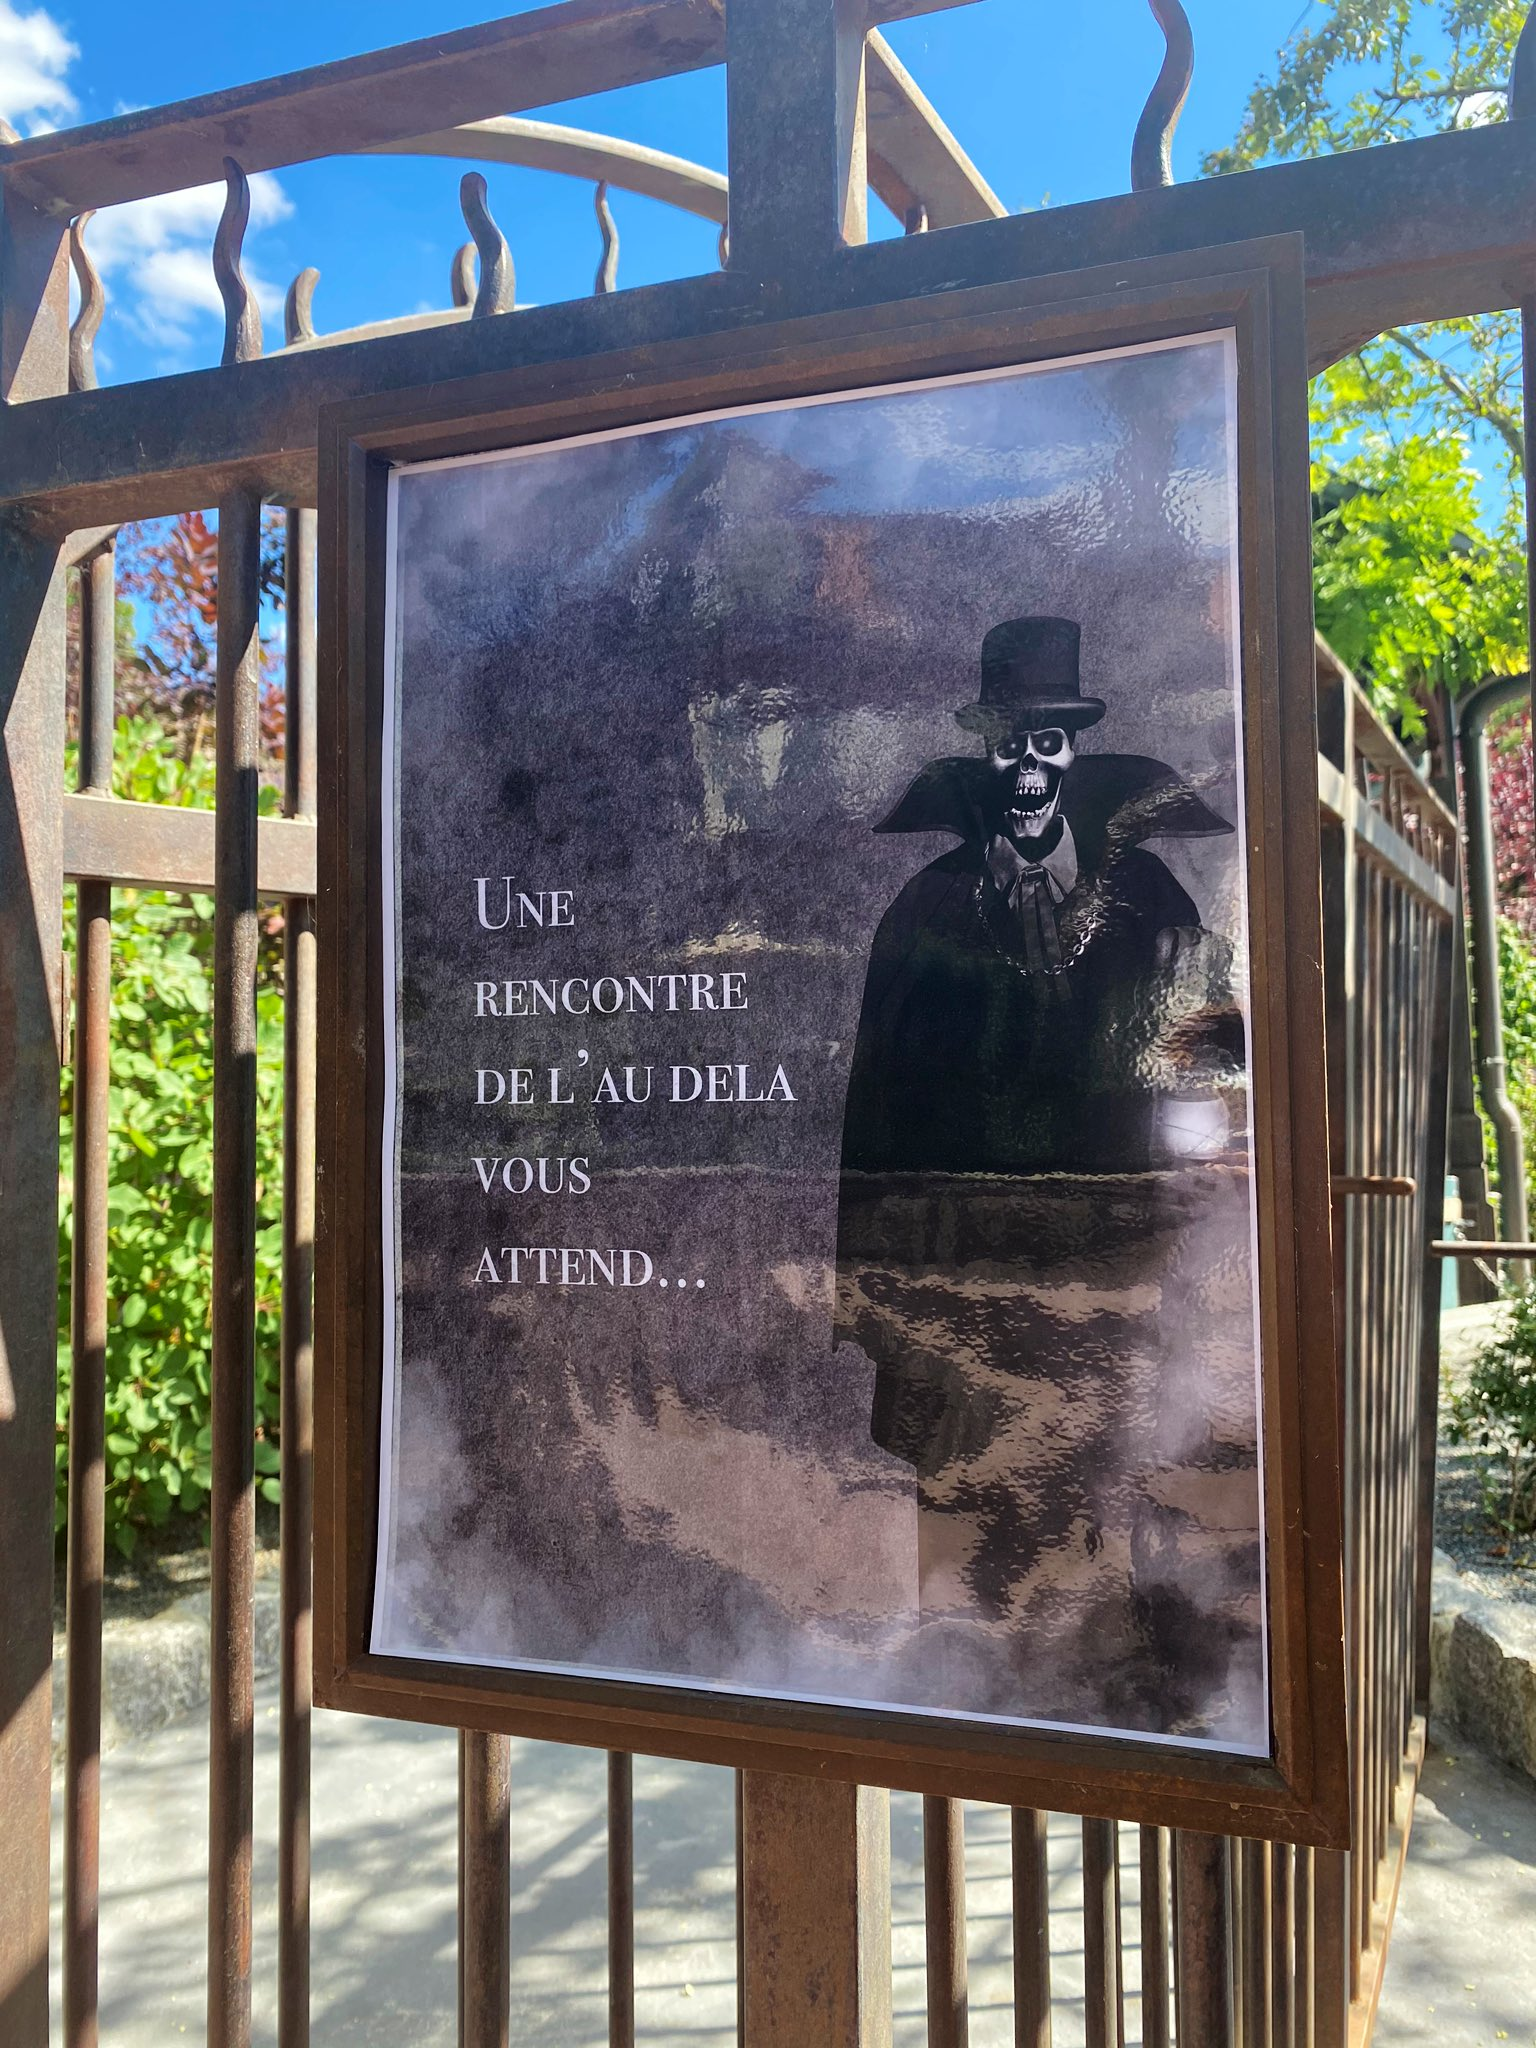 Disneyland Paris ouvert pendant la COVID-19 (juillet-octobre 2020)  - Page 2 EcpxkBfXgAAQhyF?format=jpg&name=large